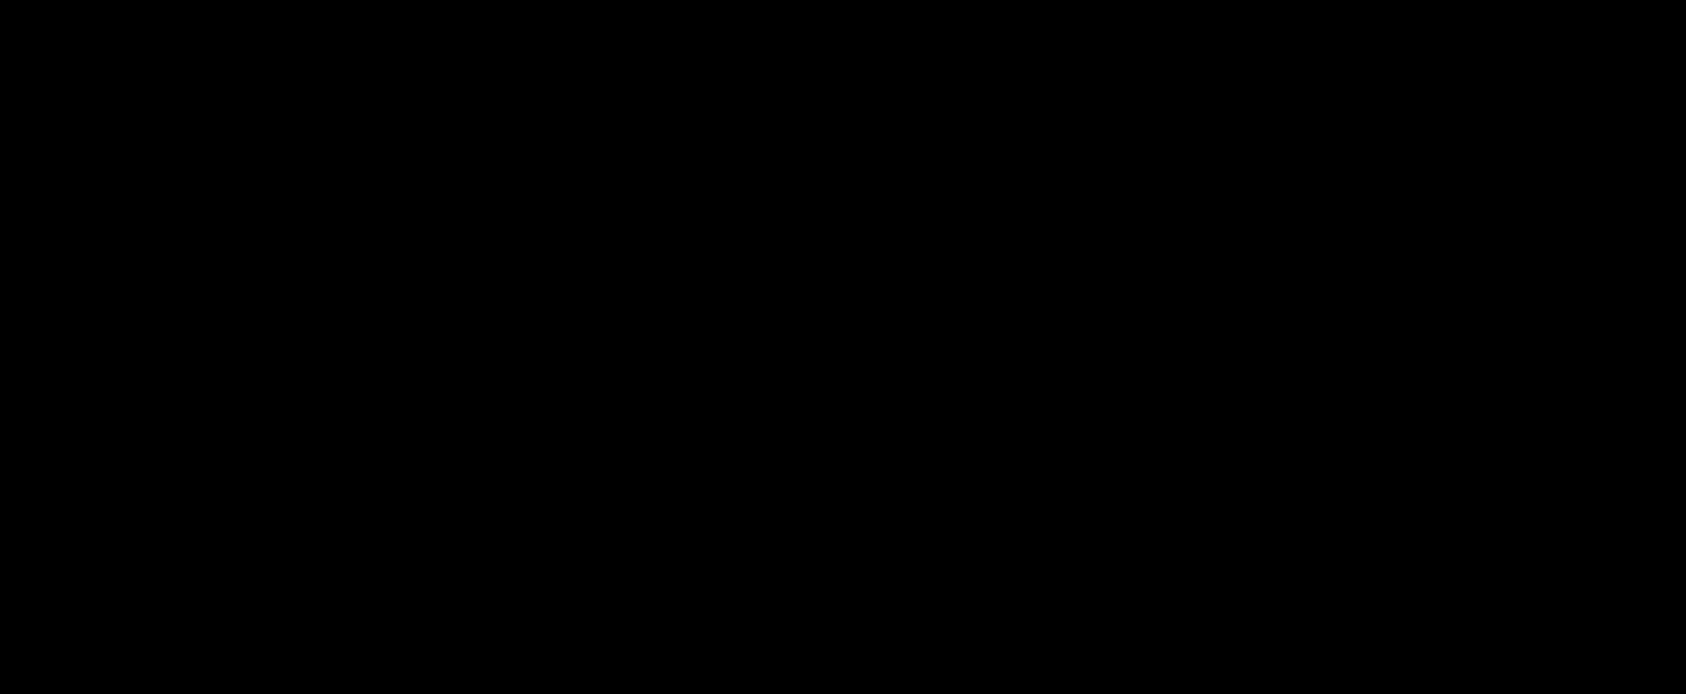 nor-logo-rgb-schwarz 1